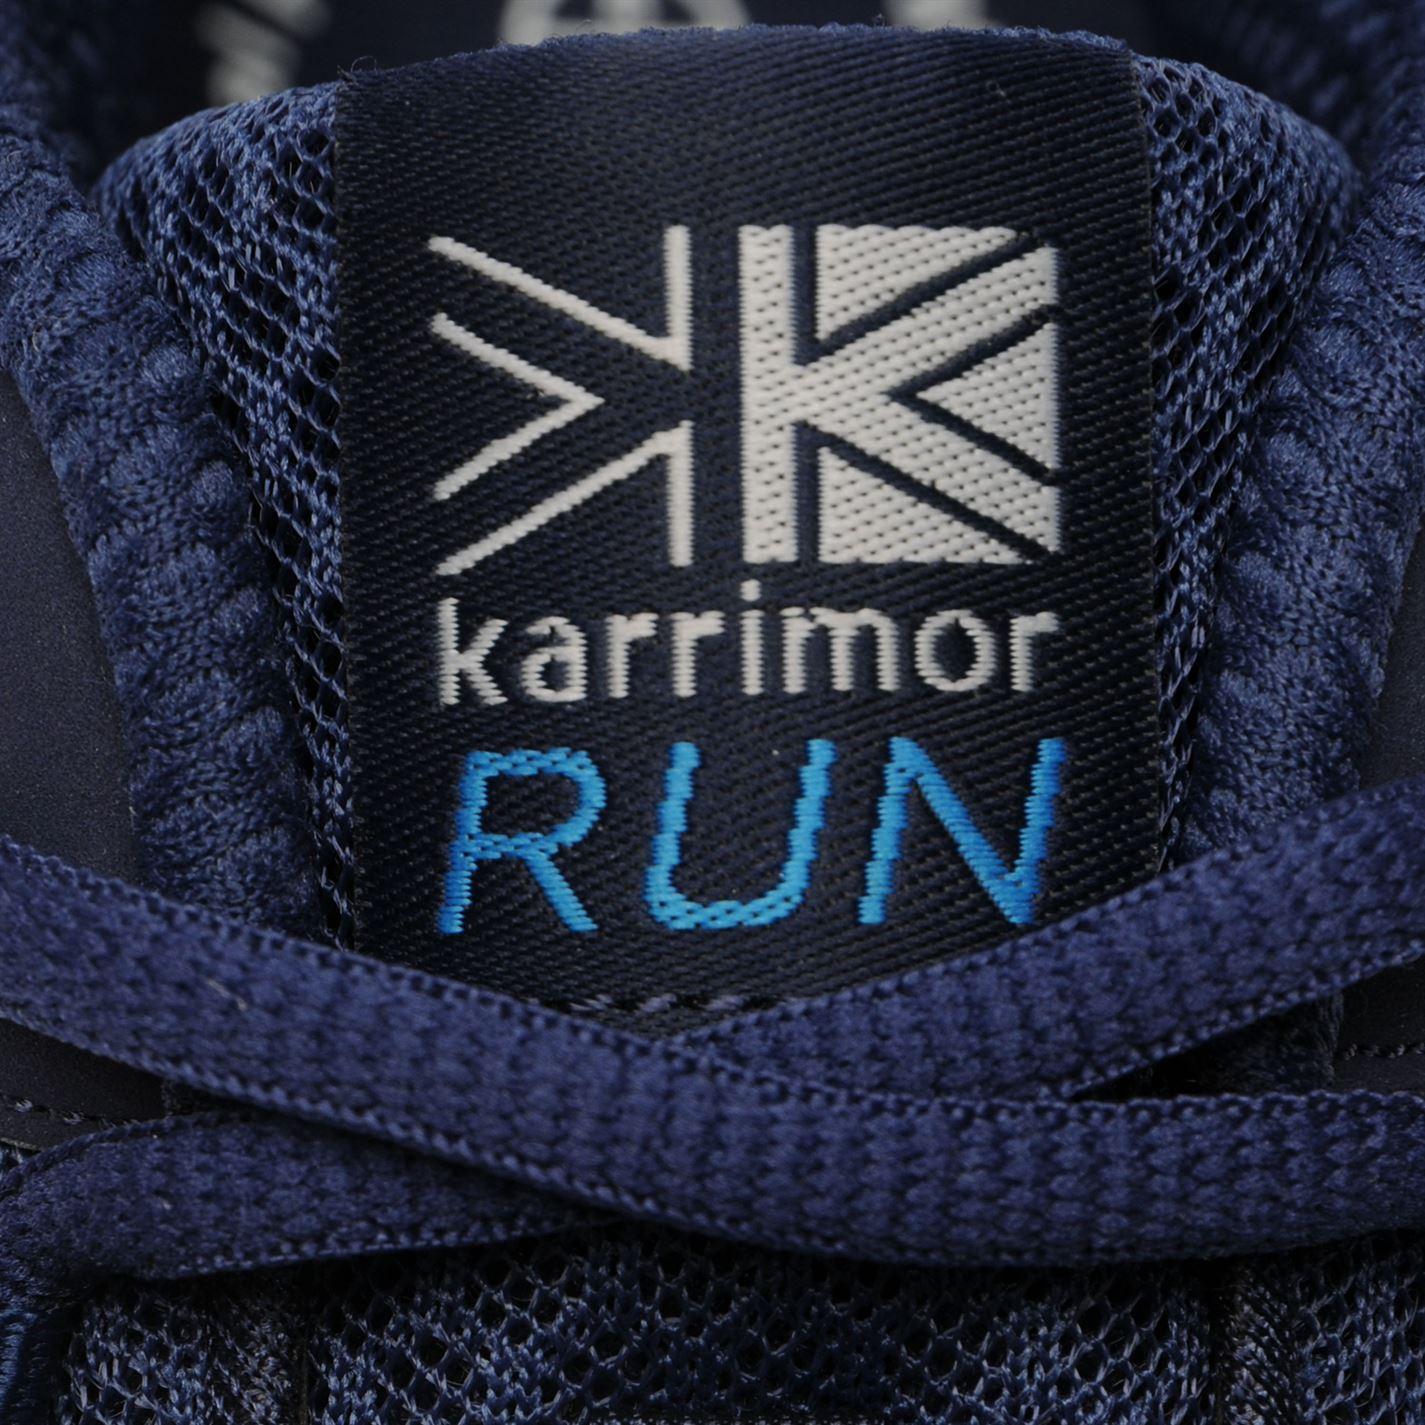 Karrimor-Mens-Duma-Trainers-Lace-Up-Sports-Running-Cross-Training-Shoes thumbnail 27